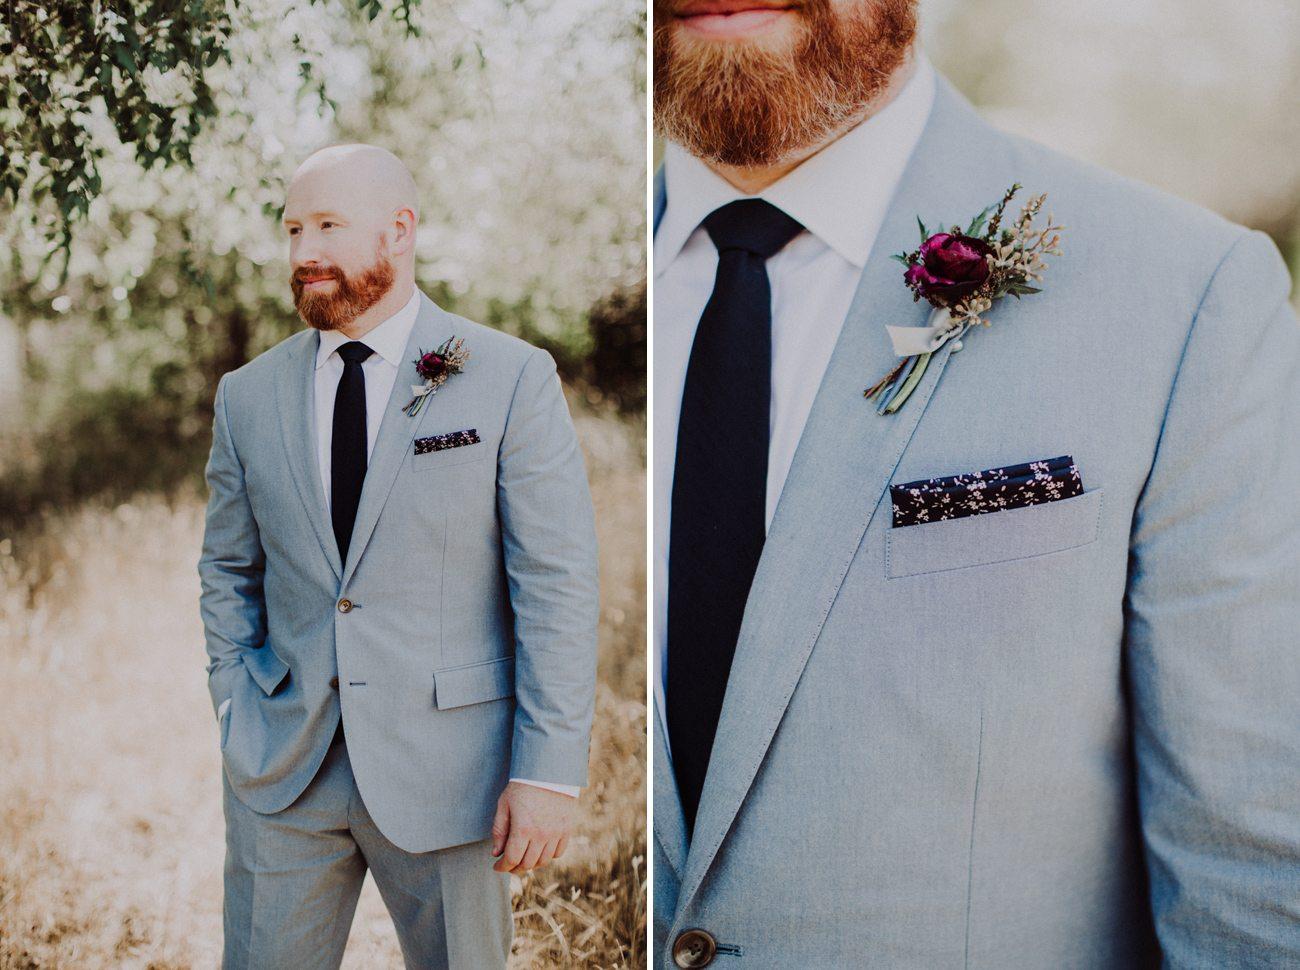 252-vernon-wedding-photographer